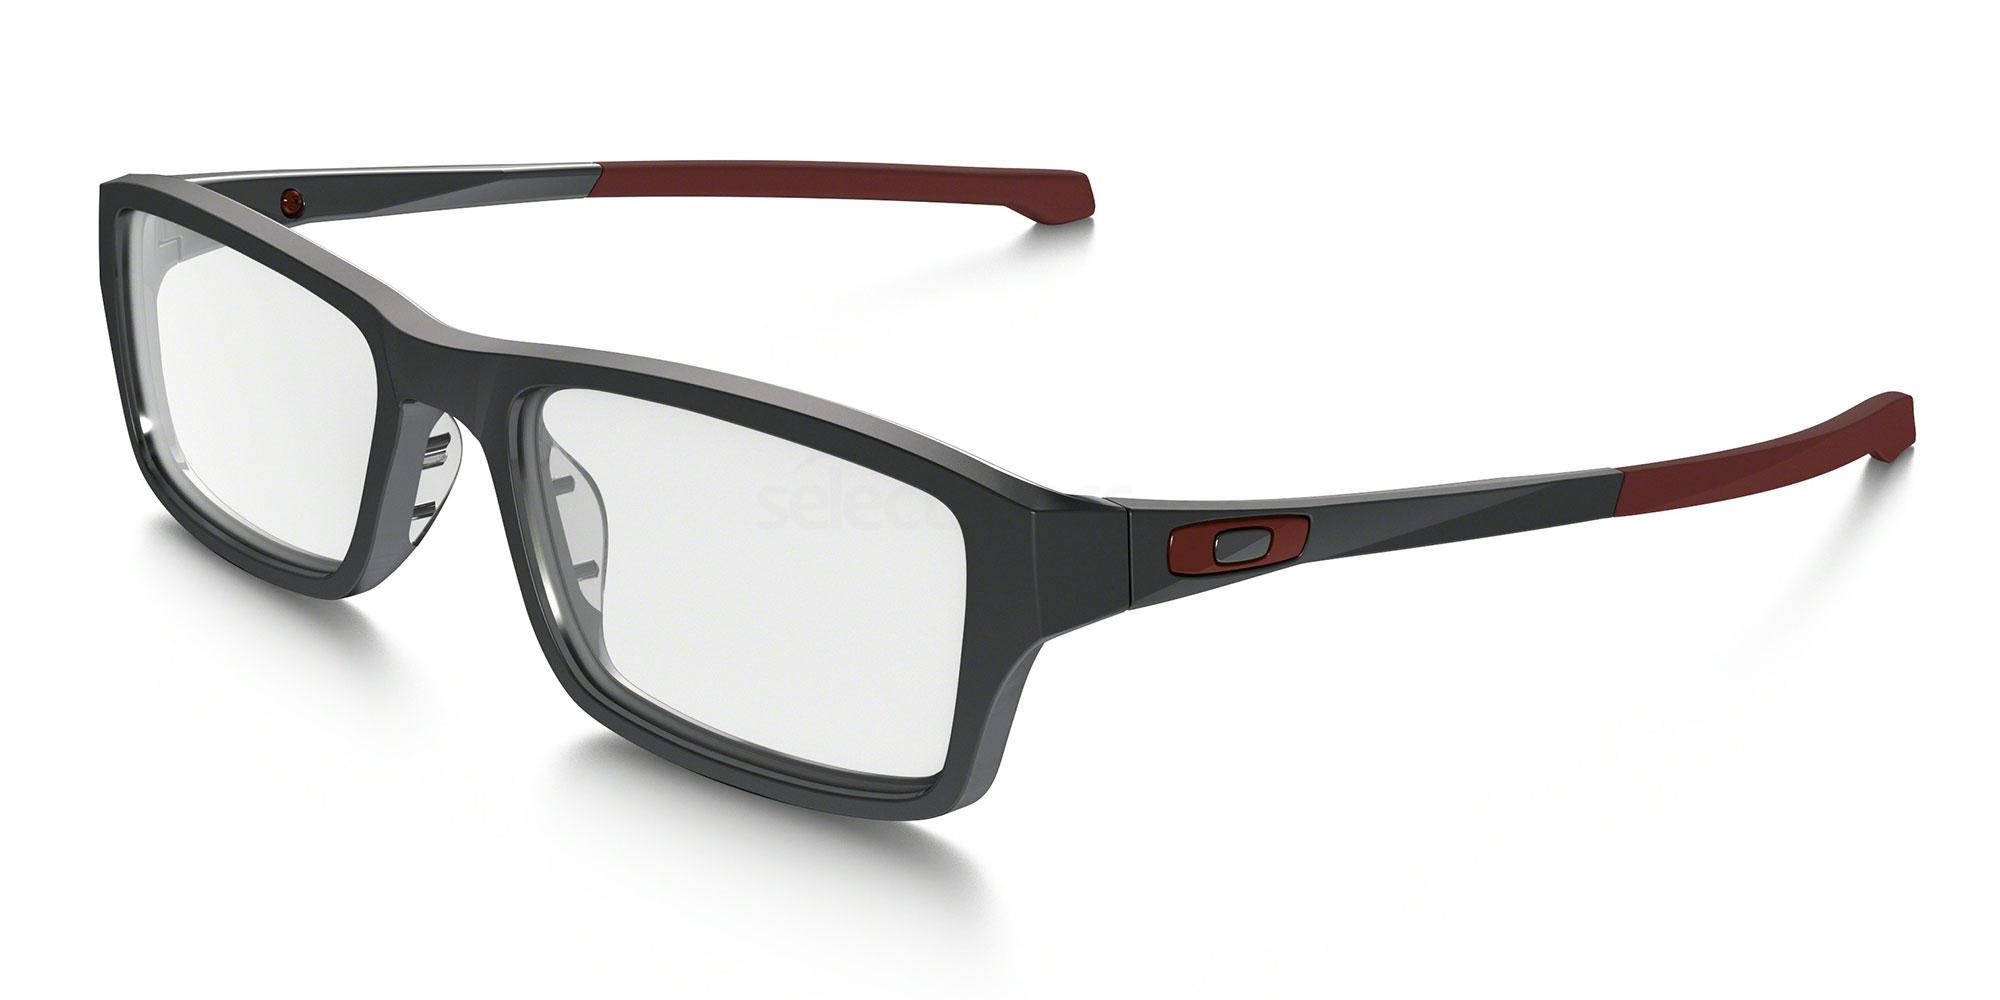 803903 OX8039 CHAMFER Glasses, Oakley